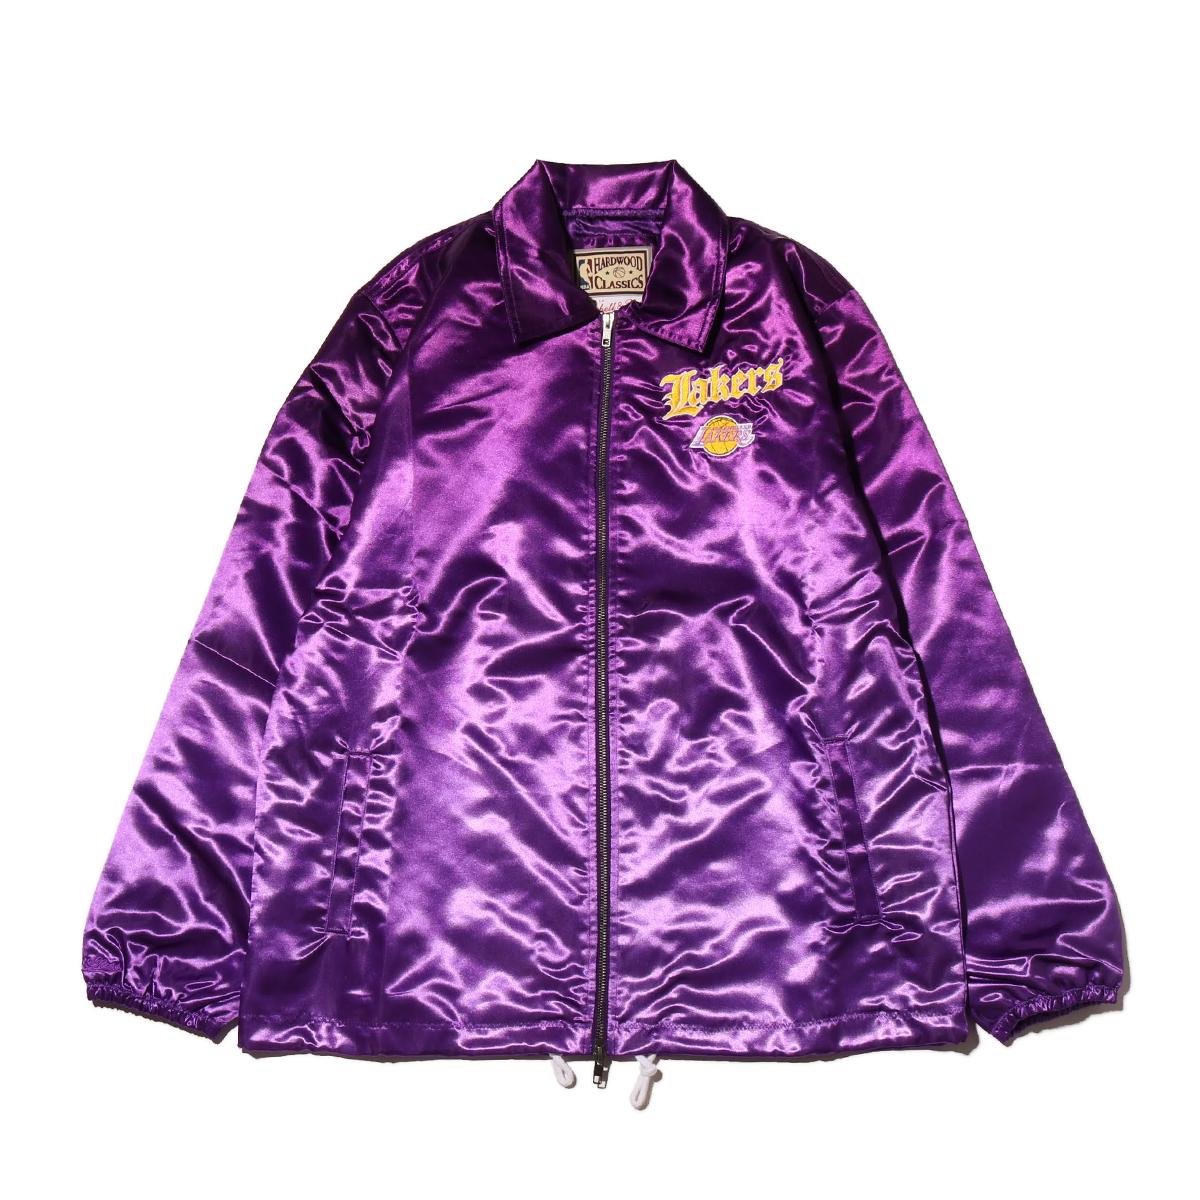 Mitchell & Ness Old English Satin Jacket LA.Lakers(PURPLE)(ミッチェルアンドネス オールドイングリッシュ ブルゾン/ロサンゼルスレイカーズ)【メンズ】【ジャケット】【19HO-I】